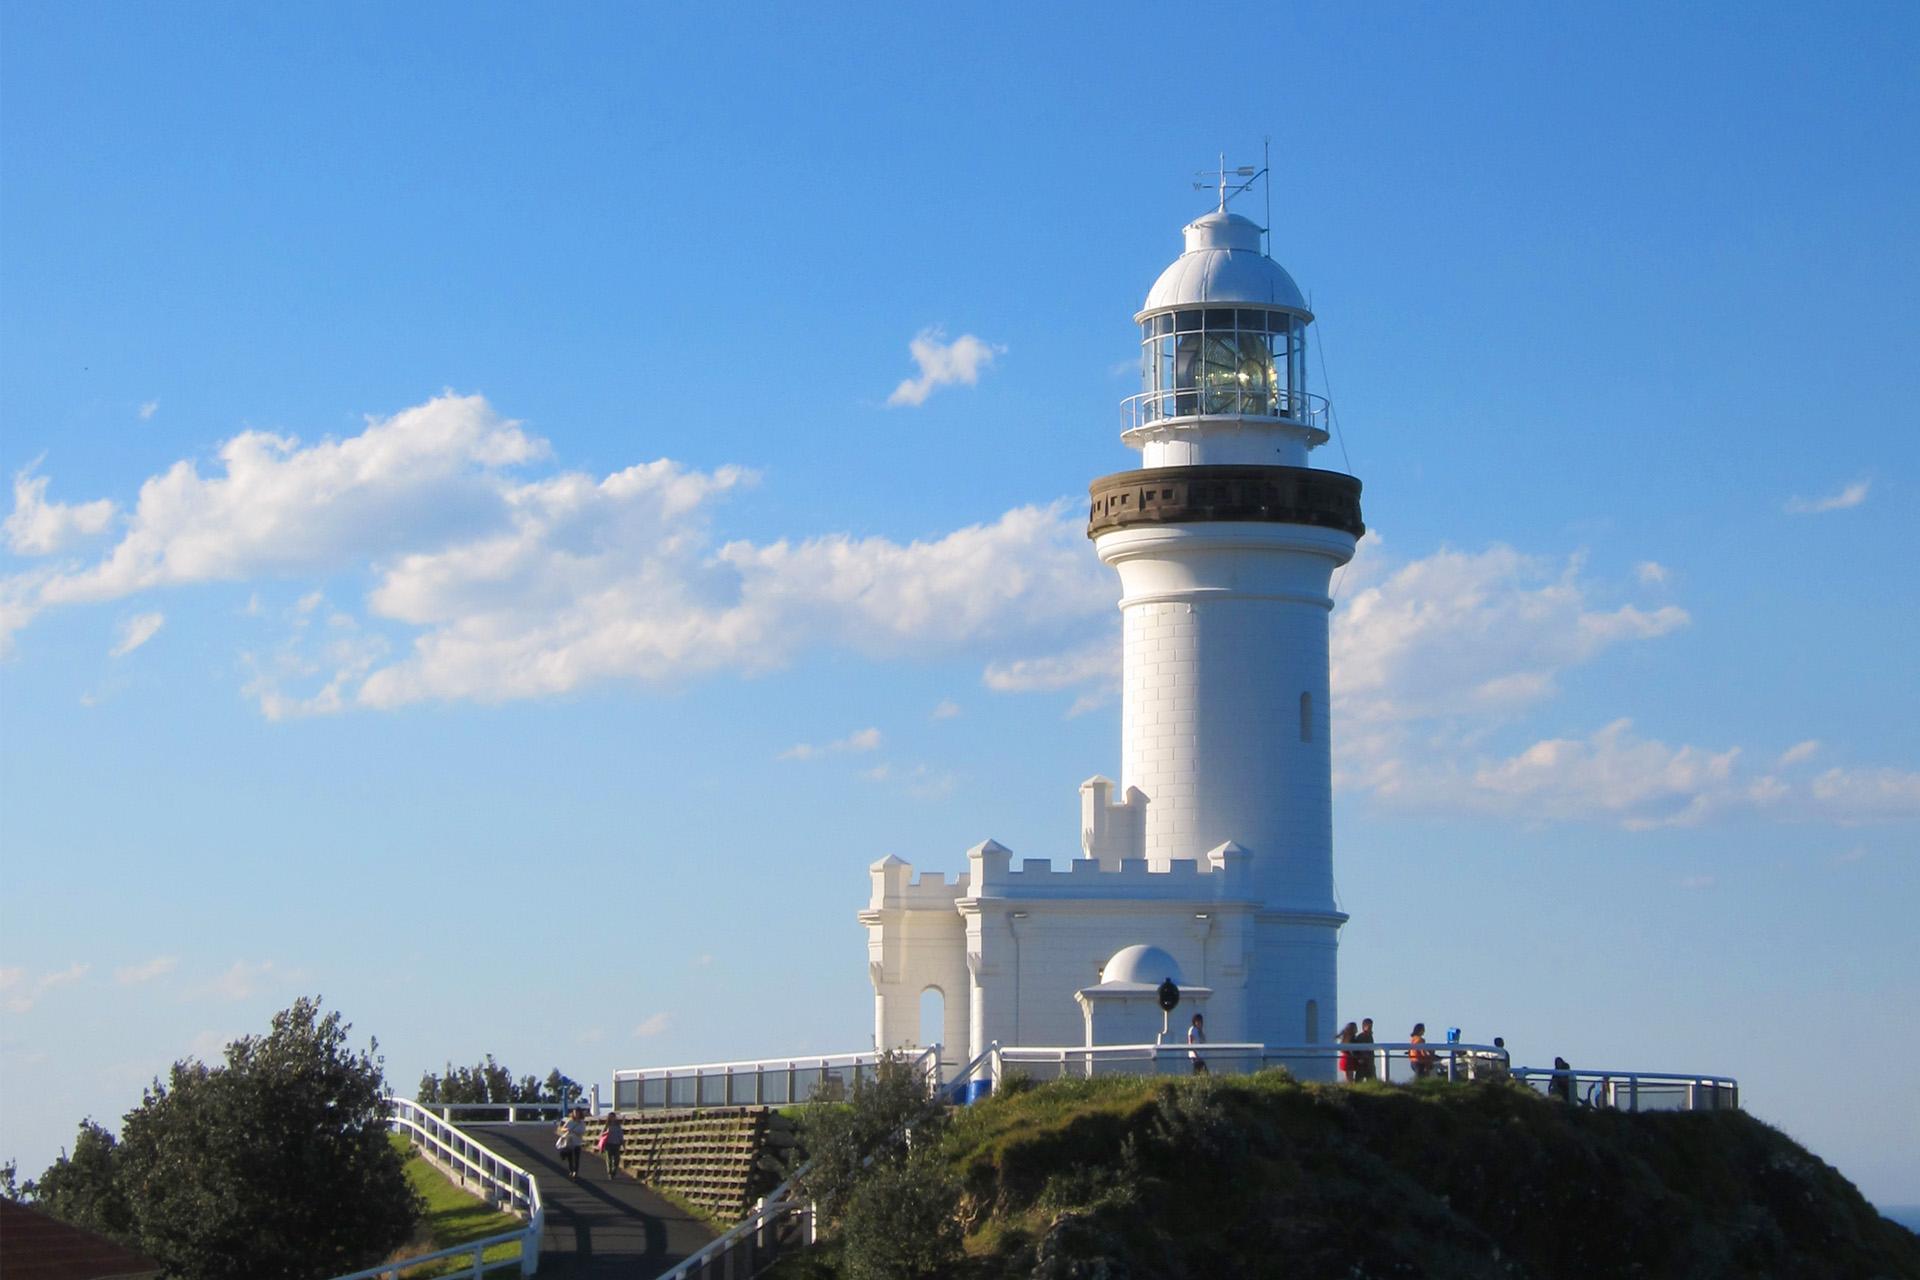 227 - Bryon Bay Lighthouse